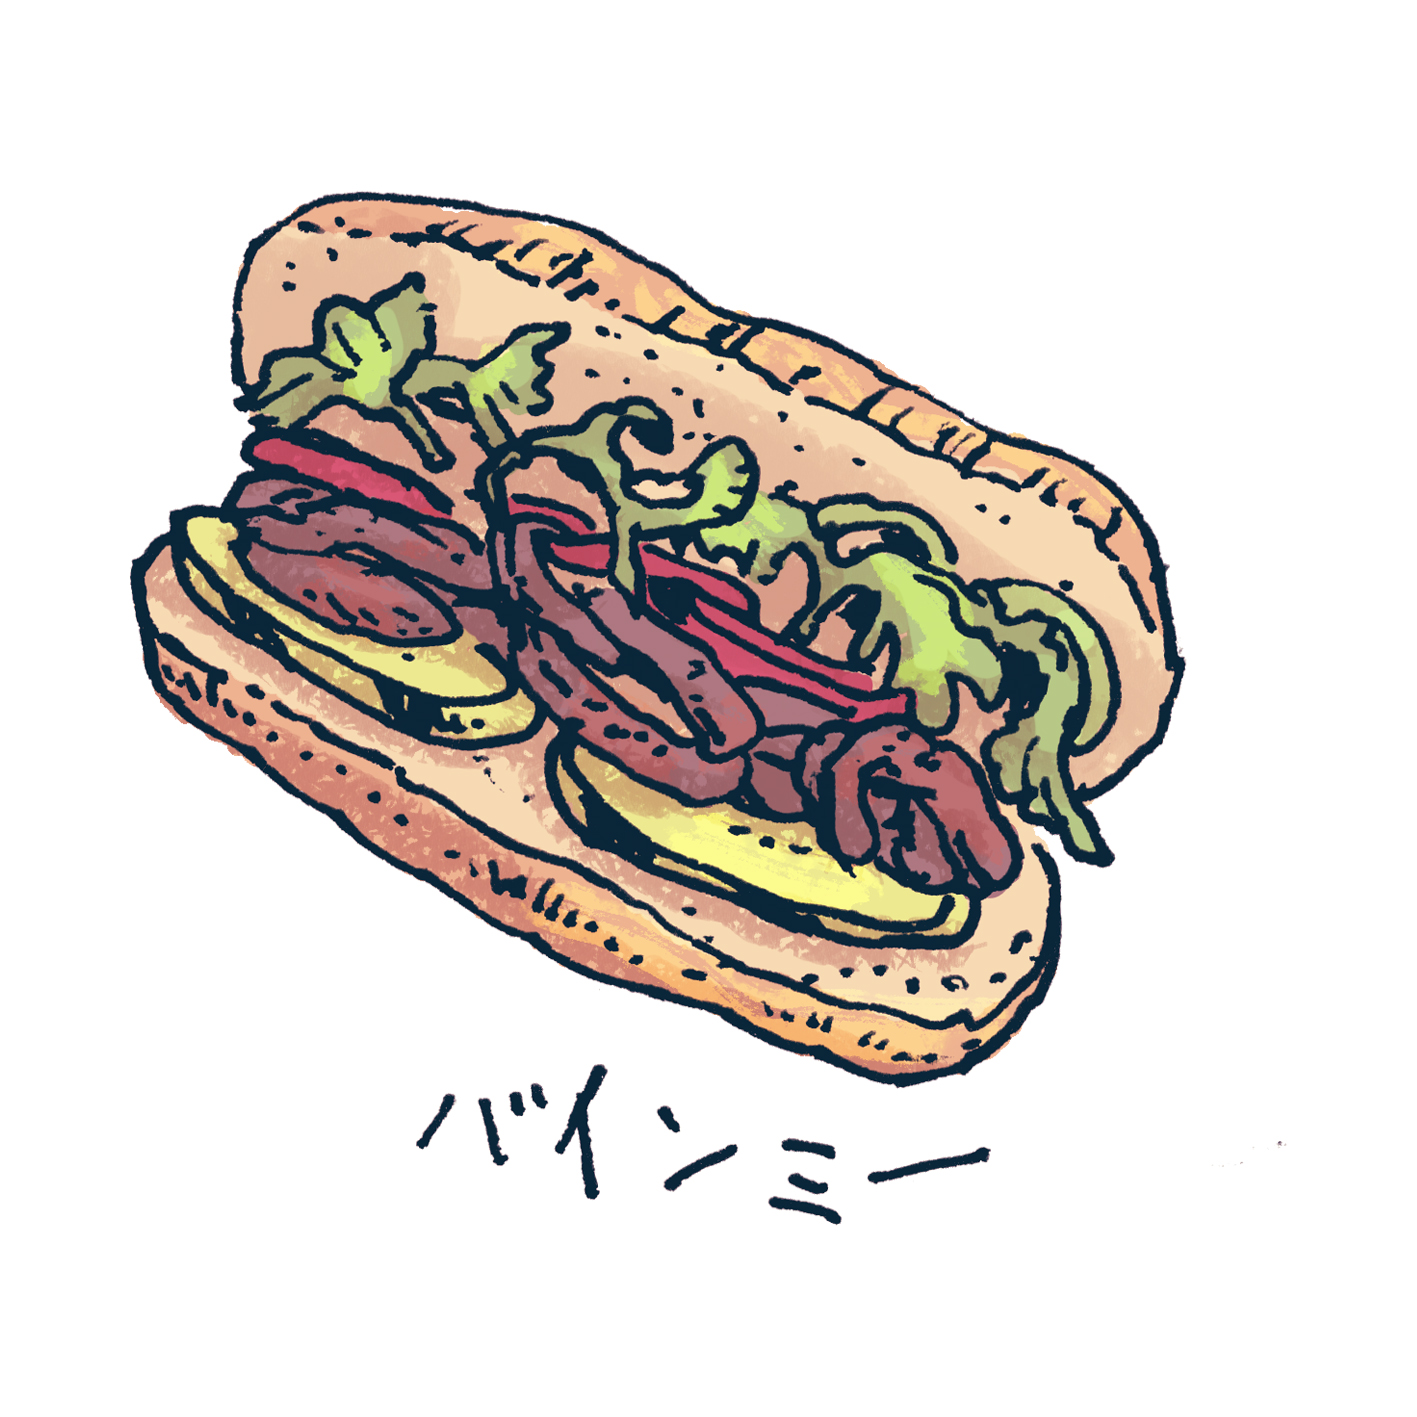 tarzan_food_6.jpg